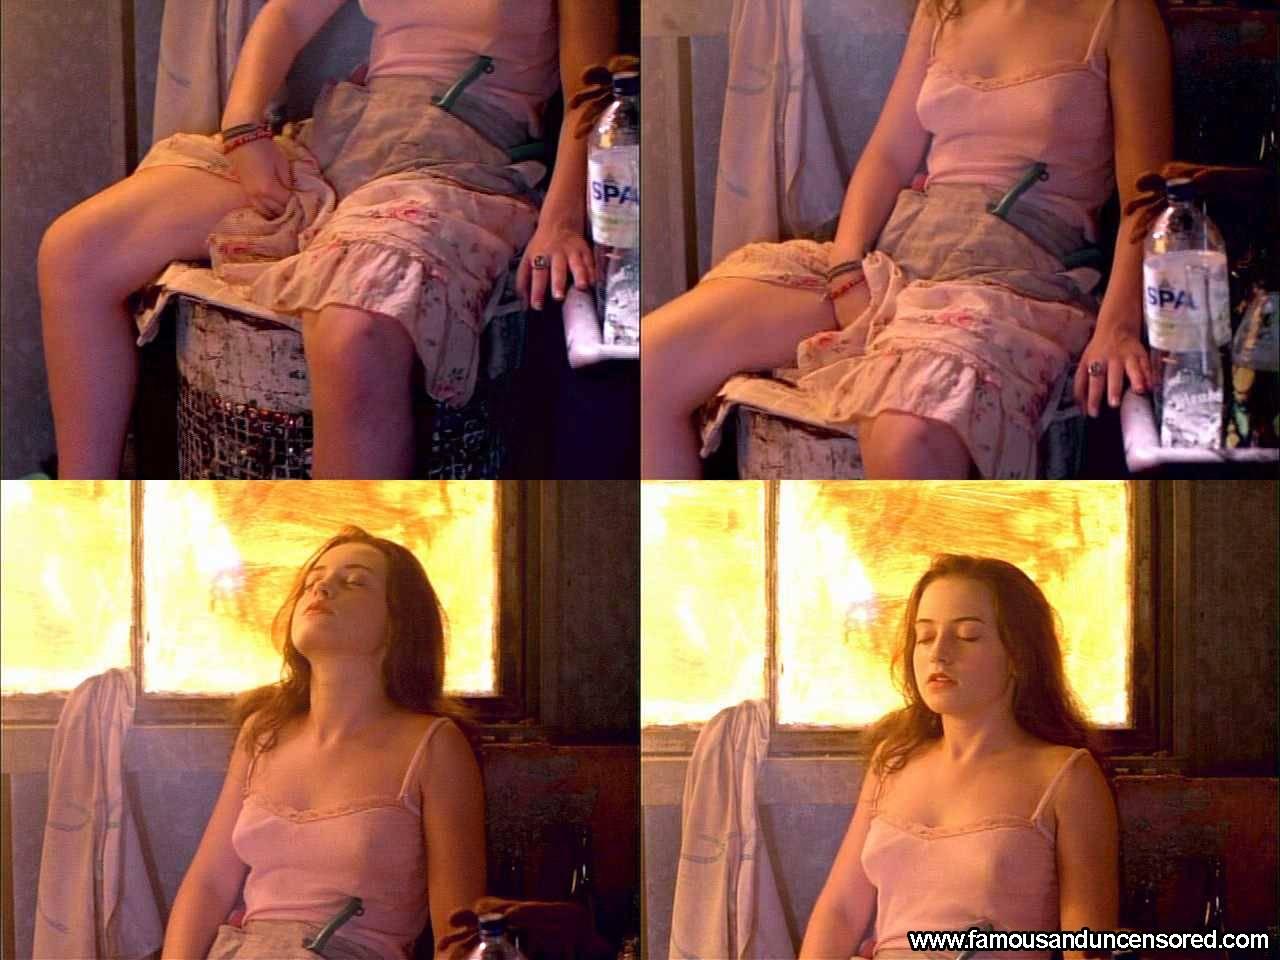 Juliette menke nackt